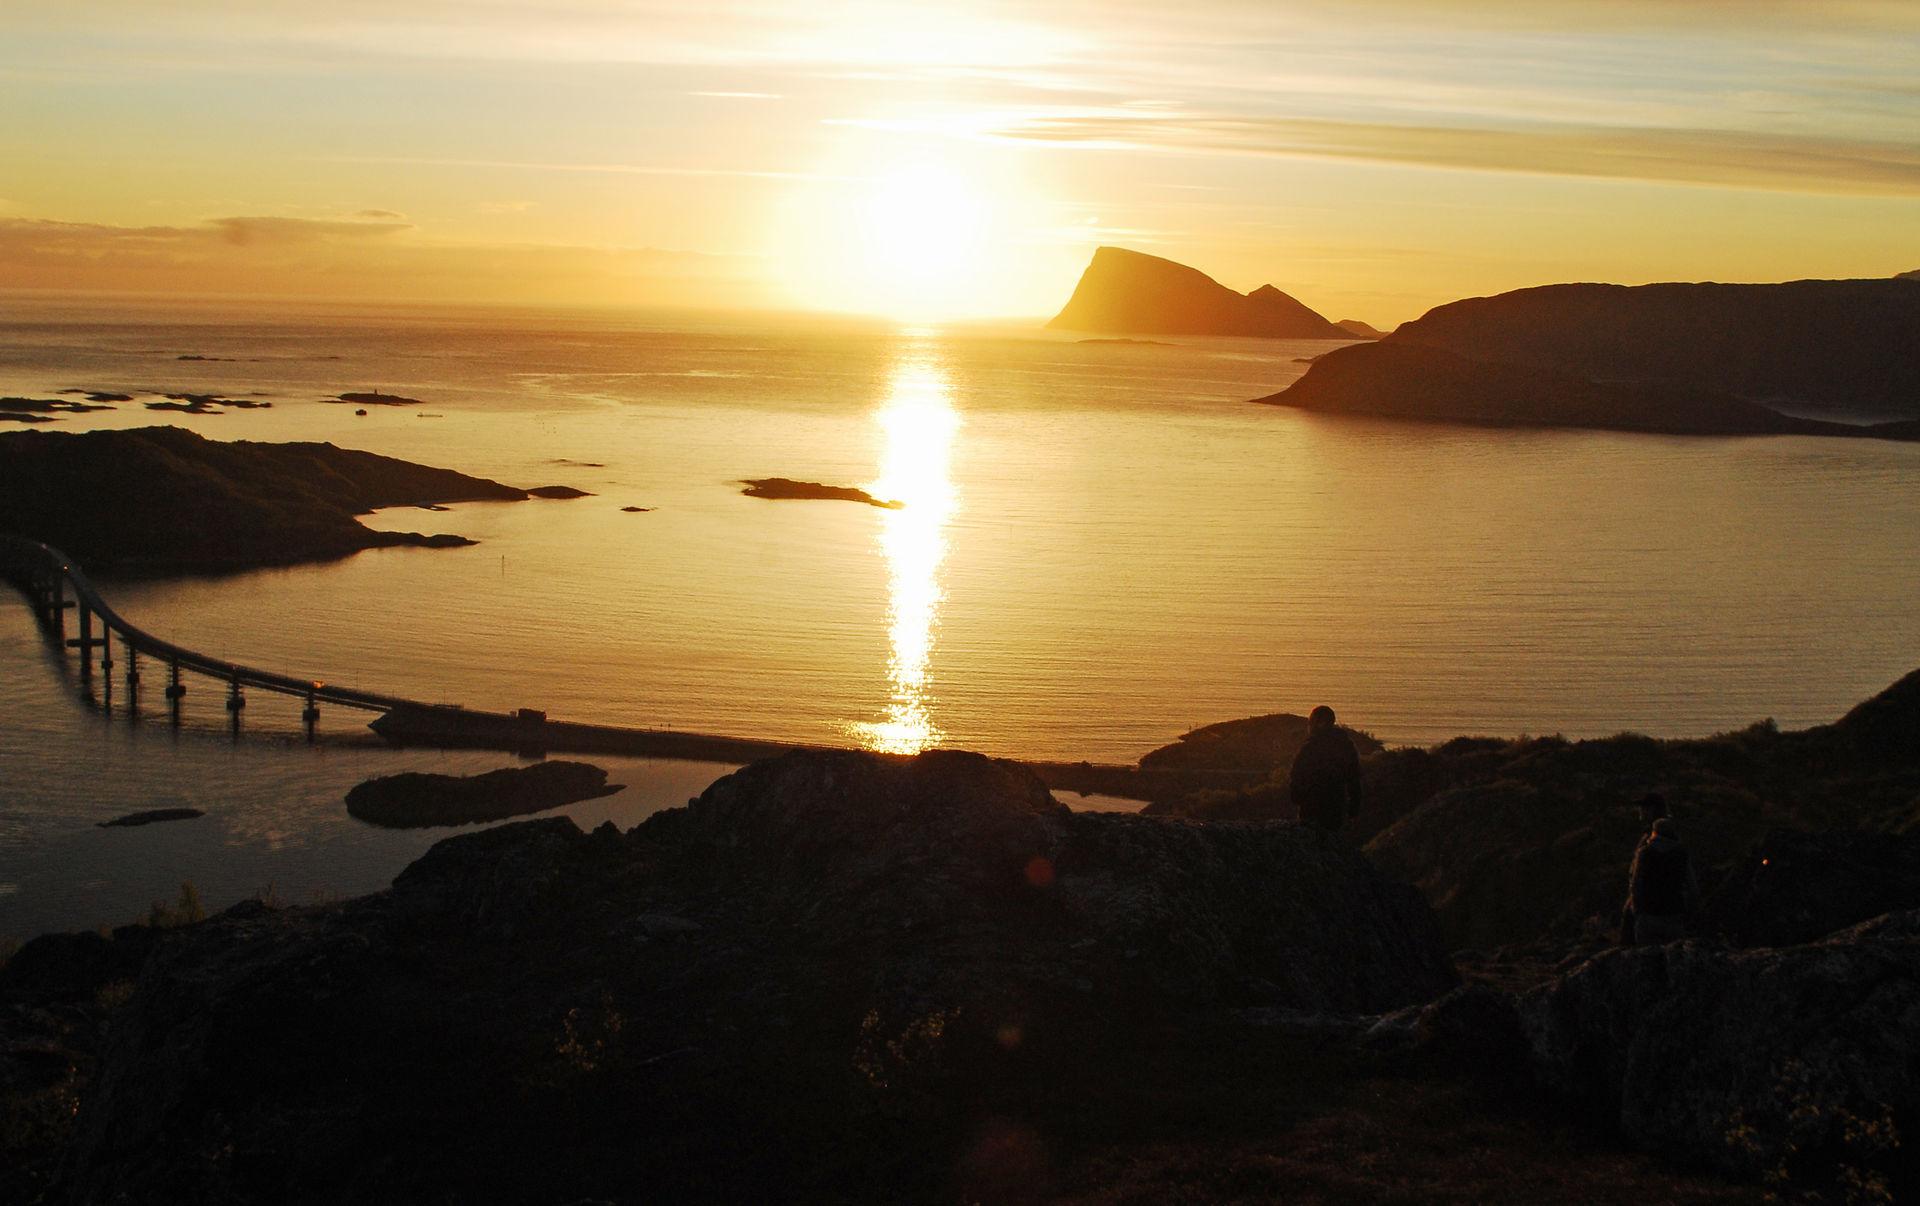 Sommaroy during Midnight Sun © Knut Hansvold